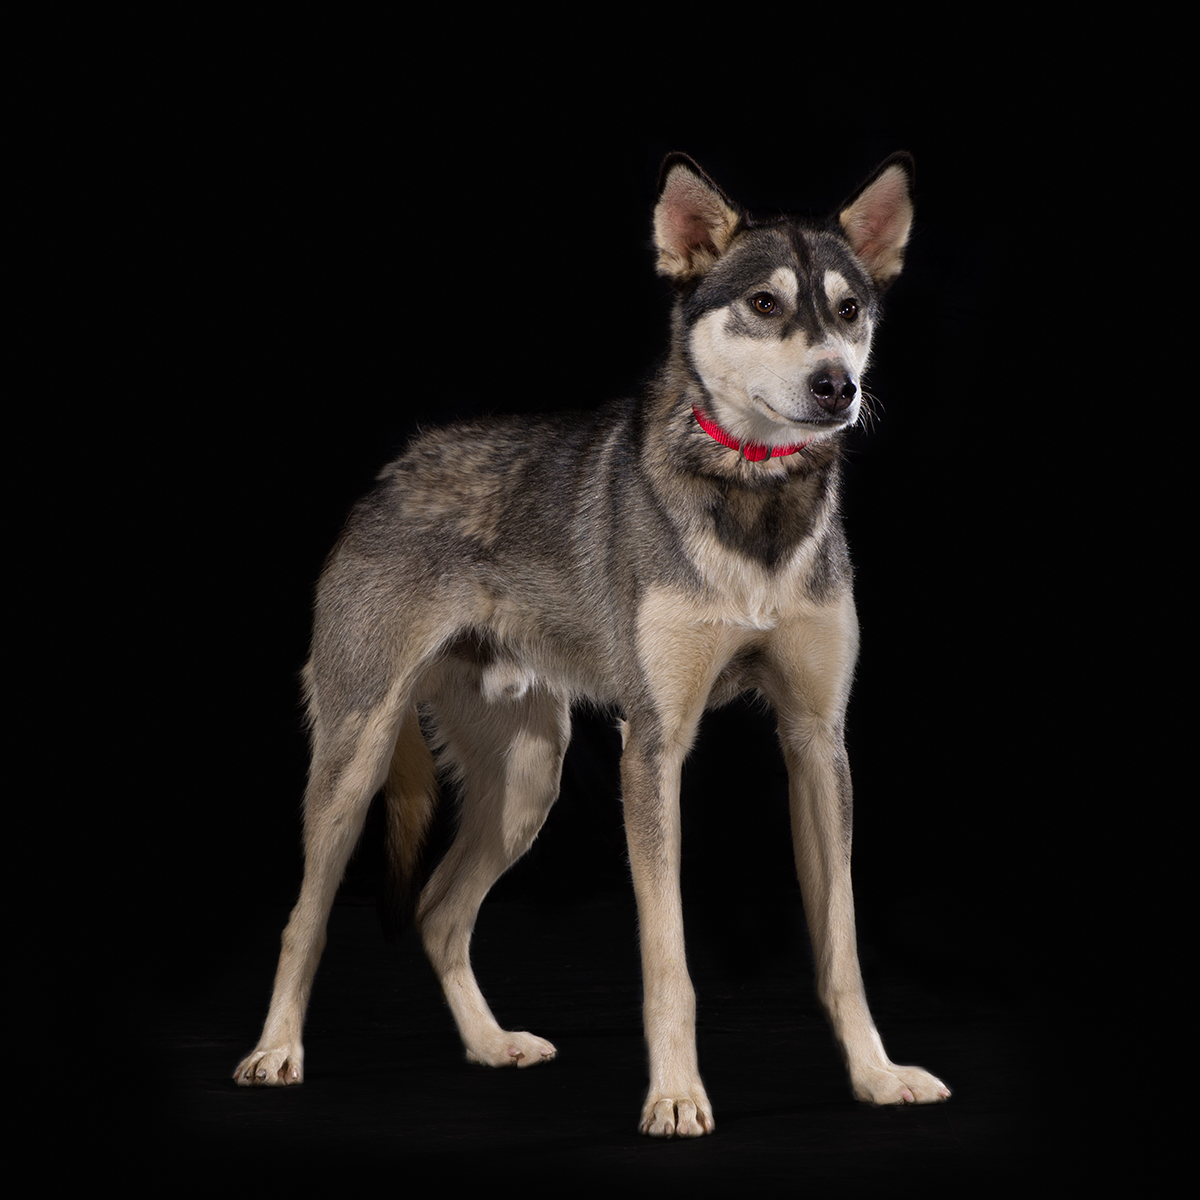 Dog With Fan : Dog fan club draws waylon jefe and mismo sp kennel